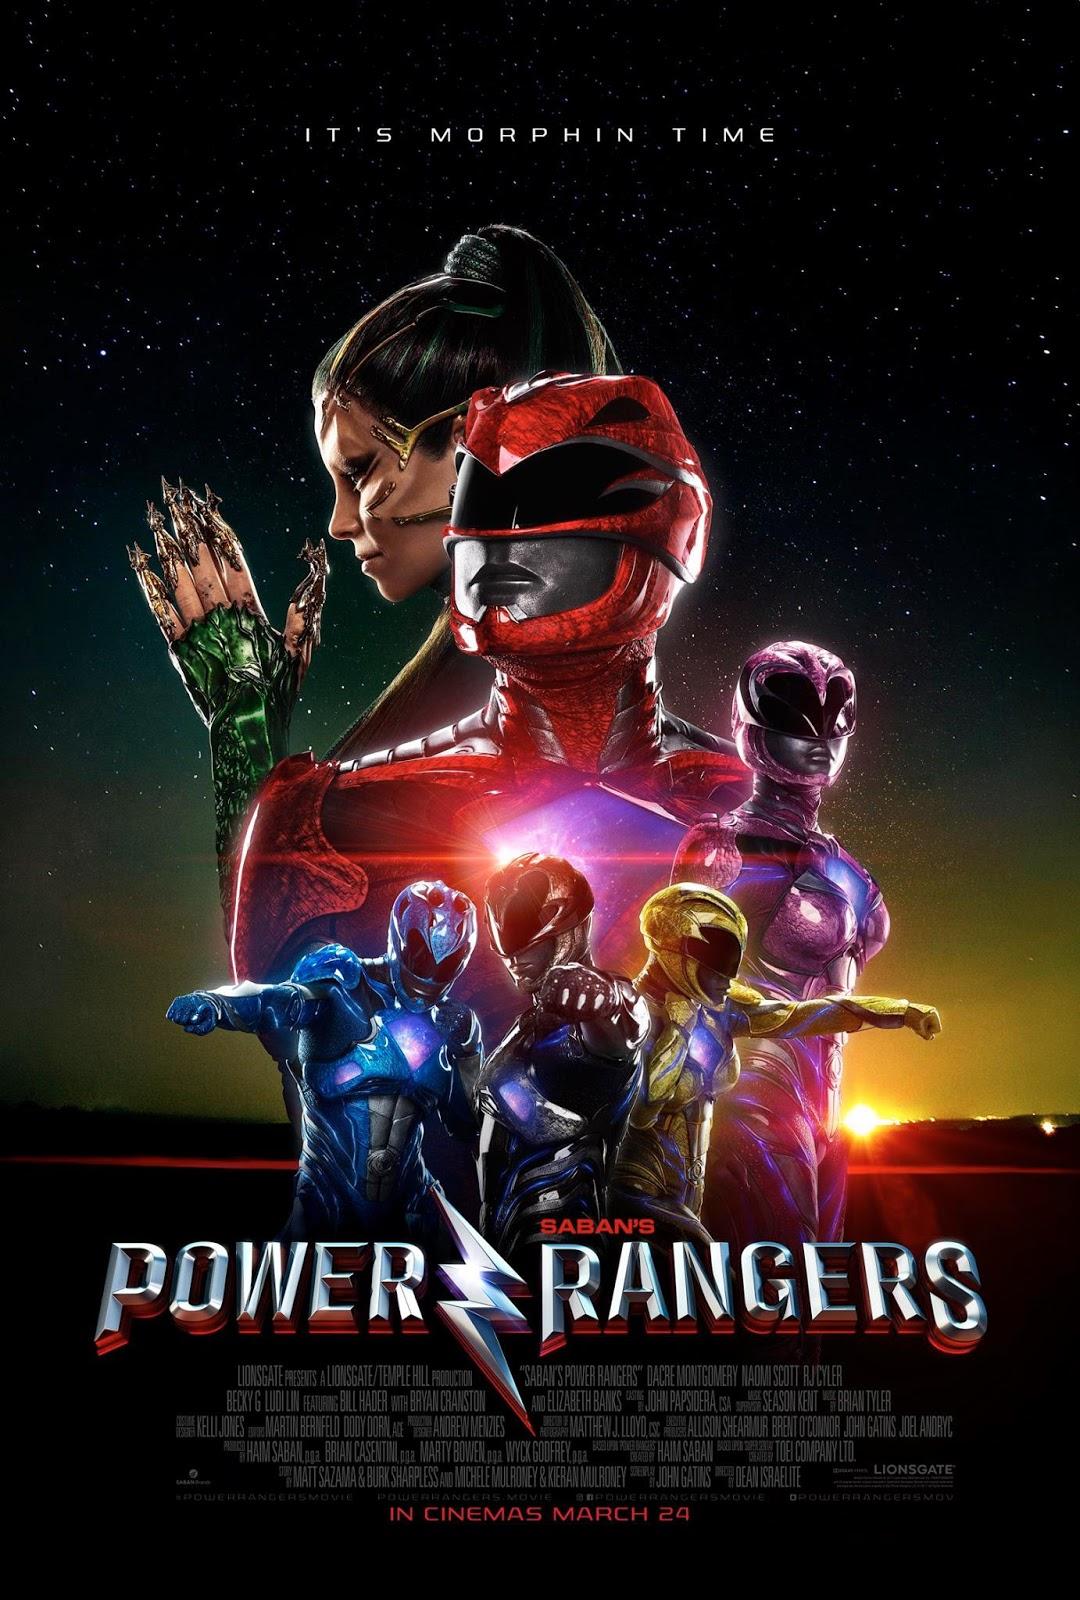 Power Rangers Movie Posters International & Domestic